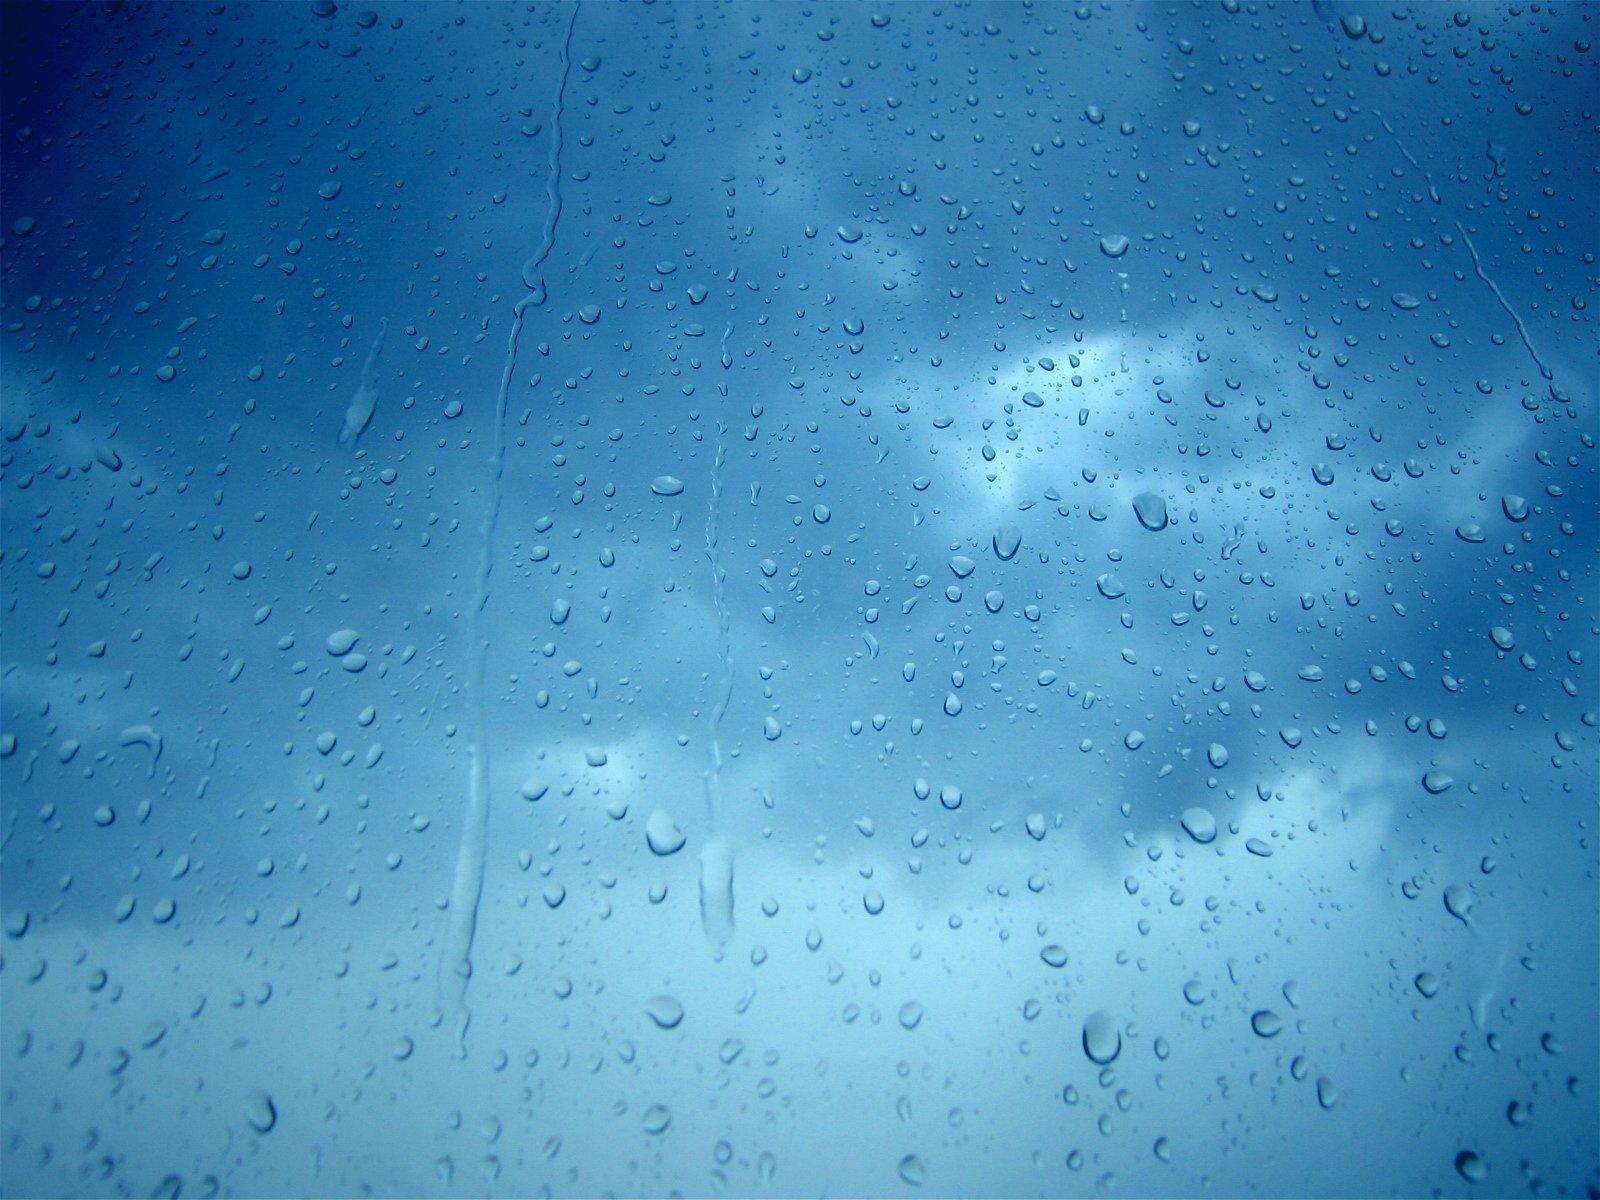 Beautiful Rain Wallpapers for Desktop Beautiful raining 1600x1200